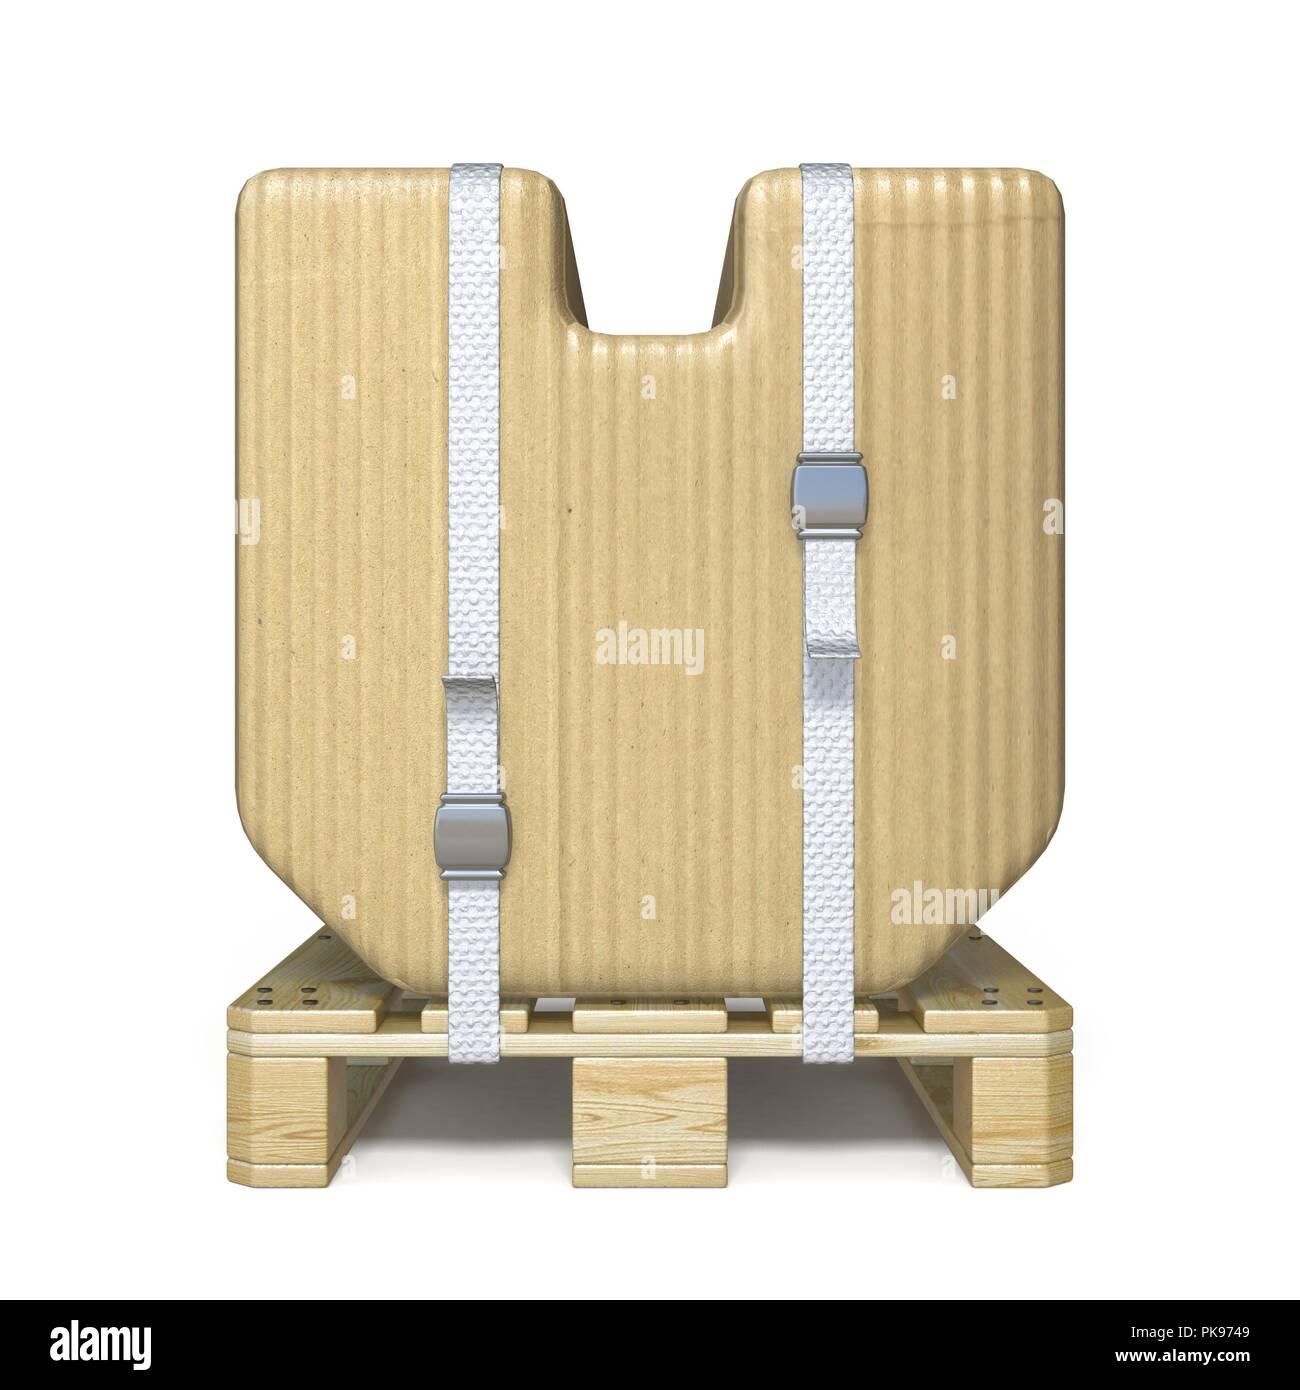 Cardboard box font Letter V on wooden pallet 3D render illustration isolated on white background